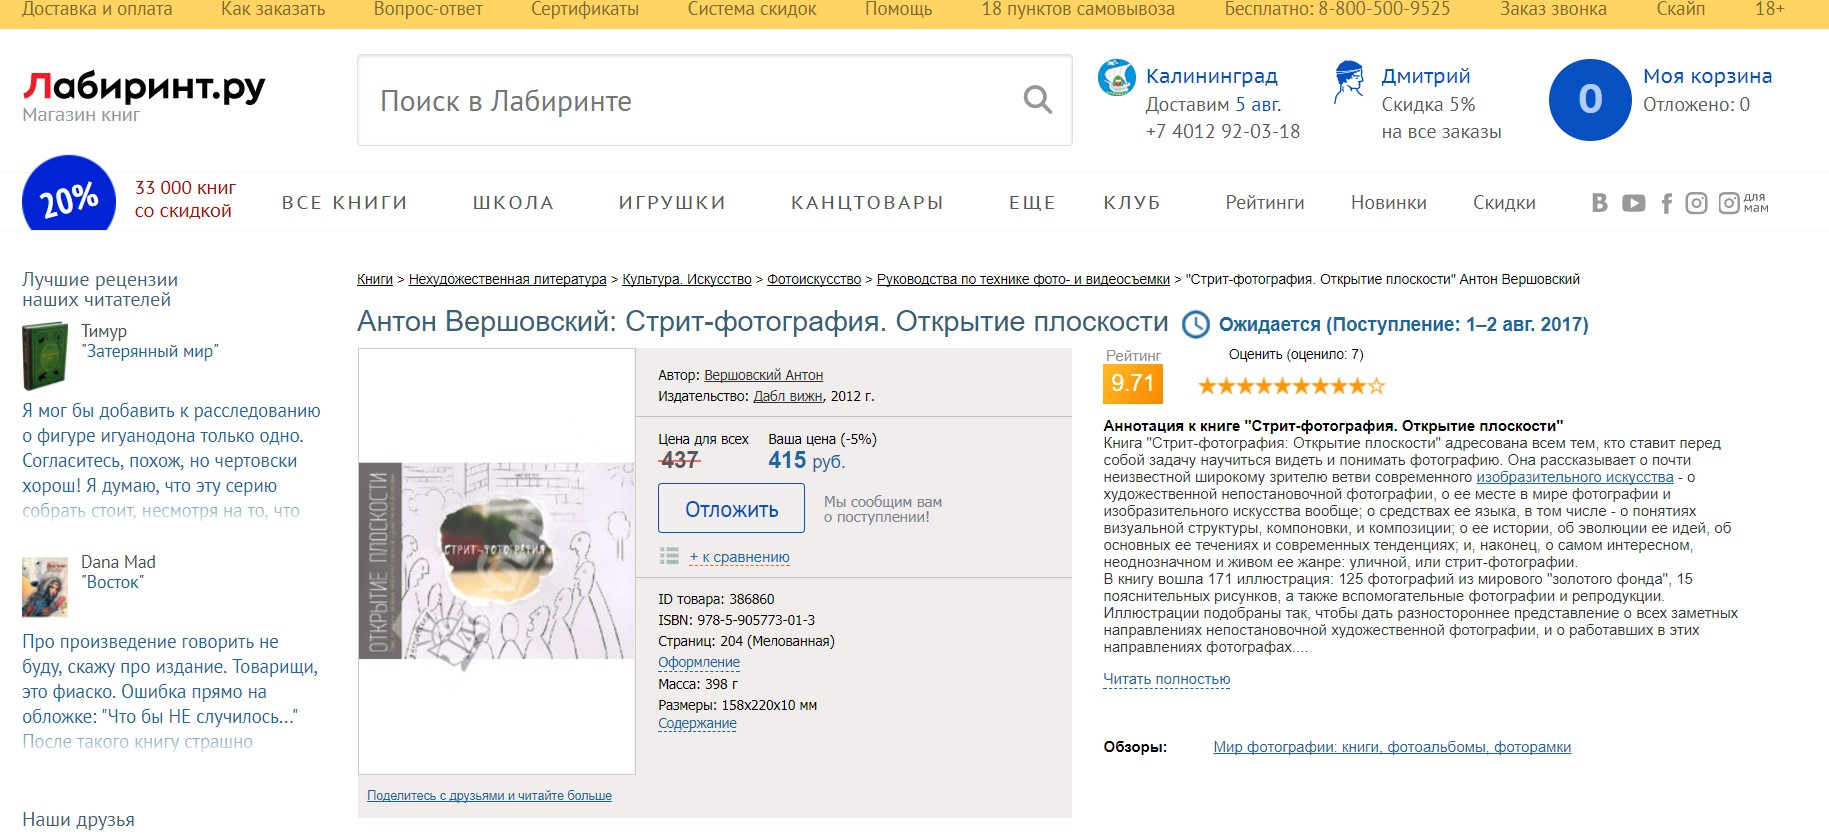 лабиринт интернет магазин книг отзывы